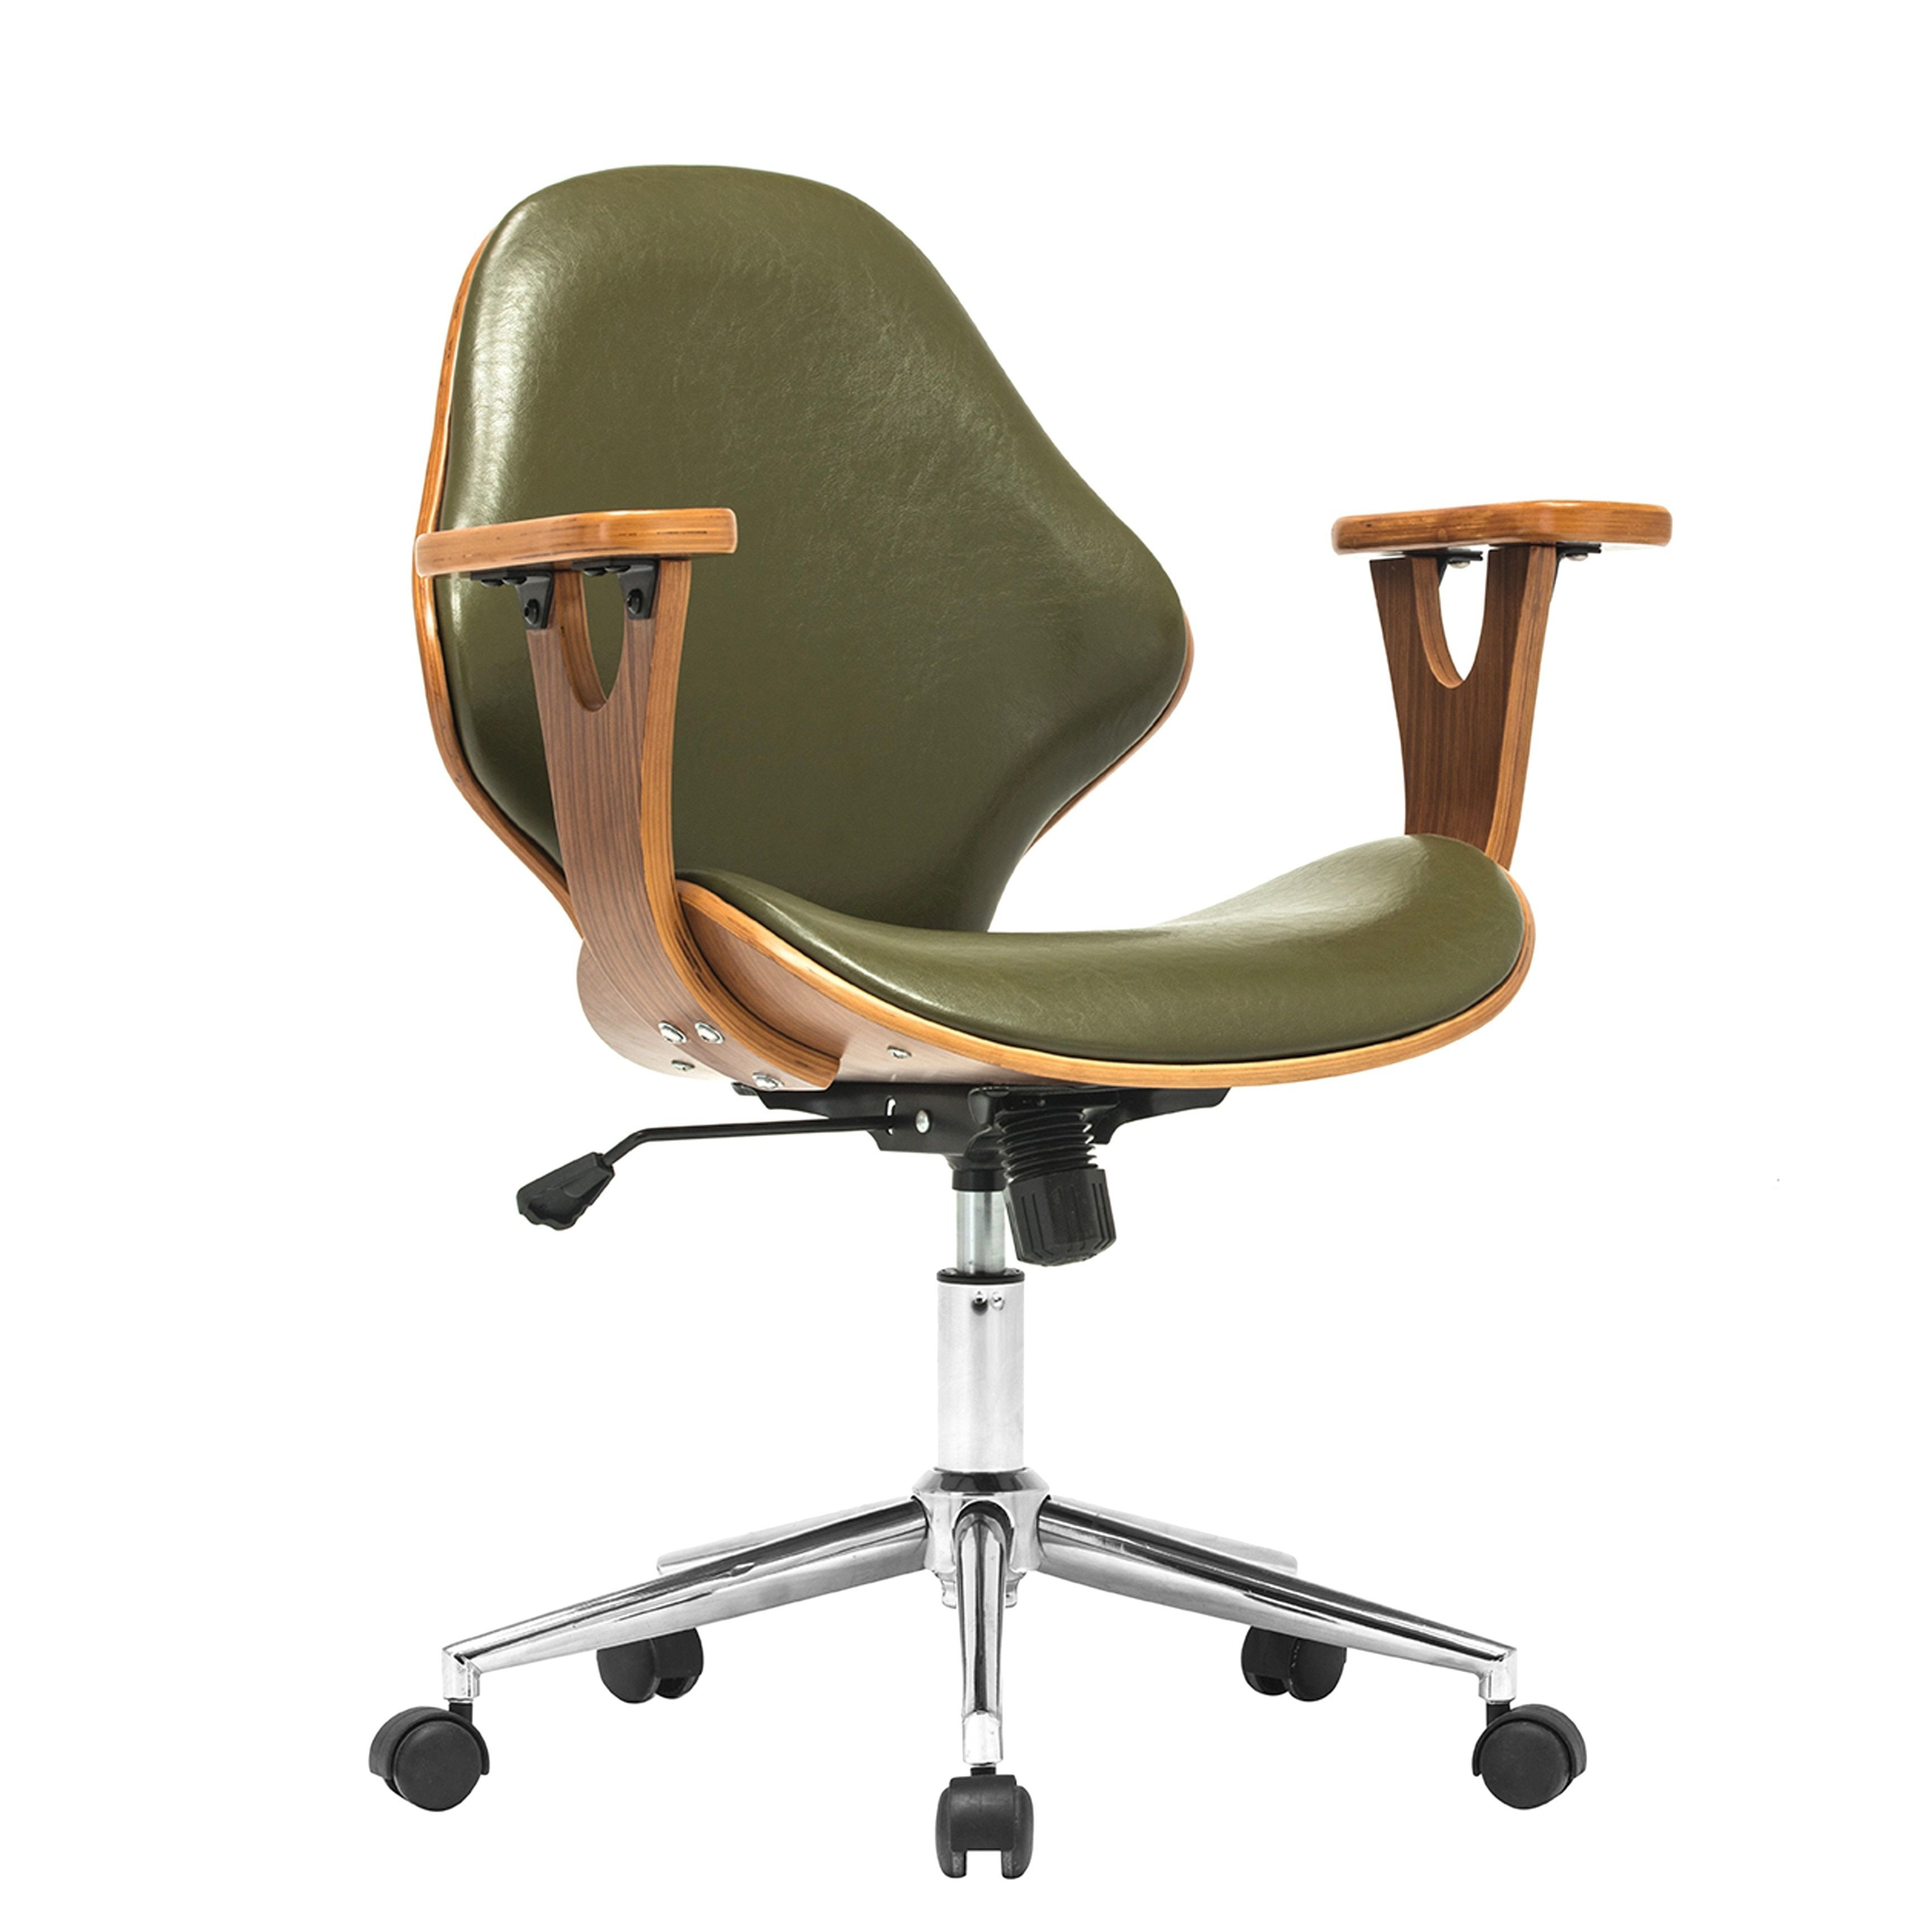 Lillian adjustable office chair green